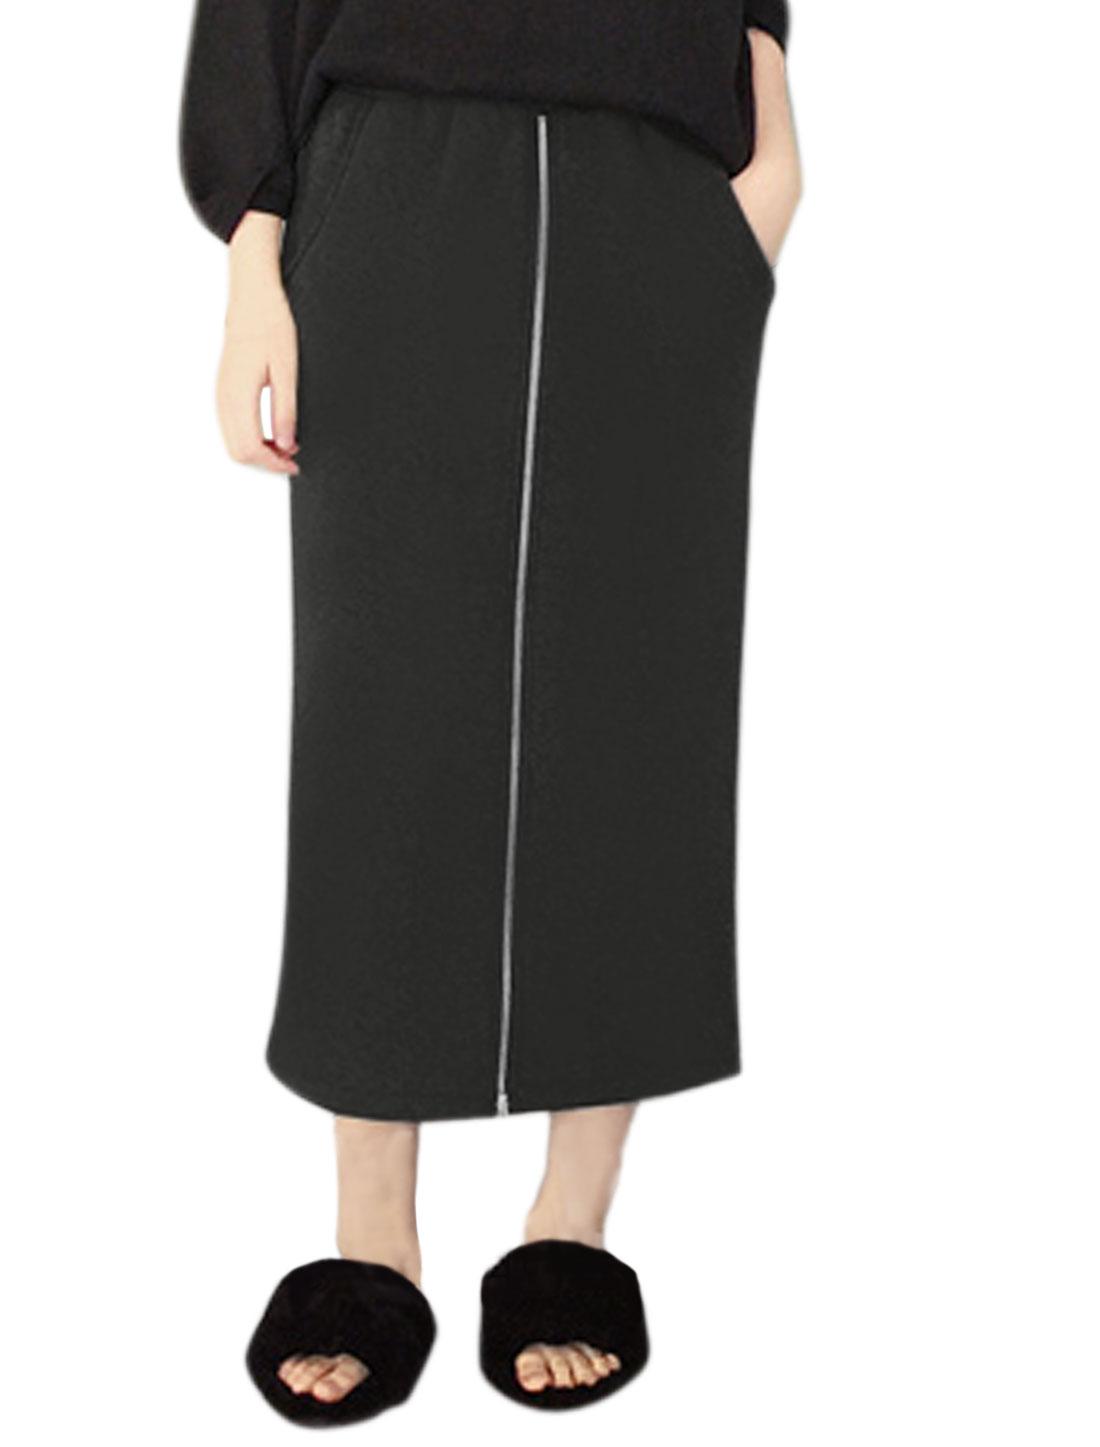 Women Zipper Front Soft Lined Straight Midi Skirt Black XS